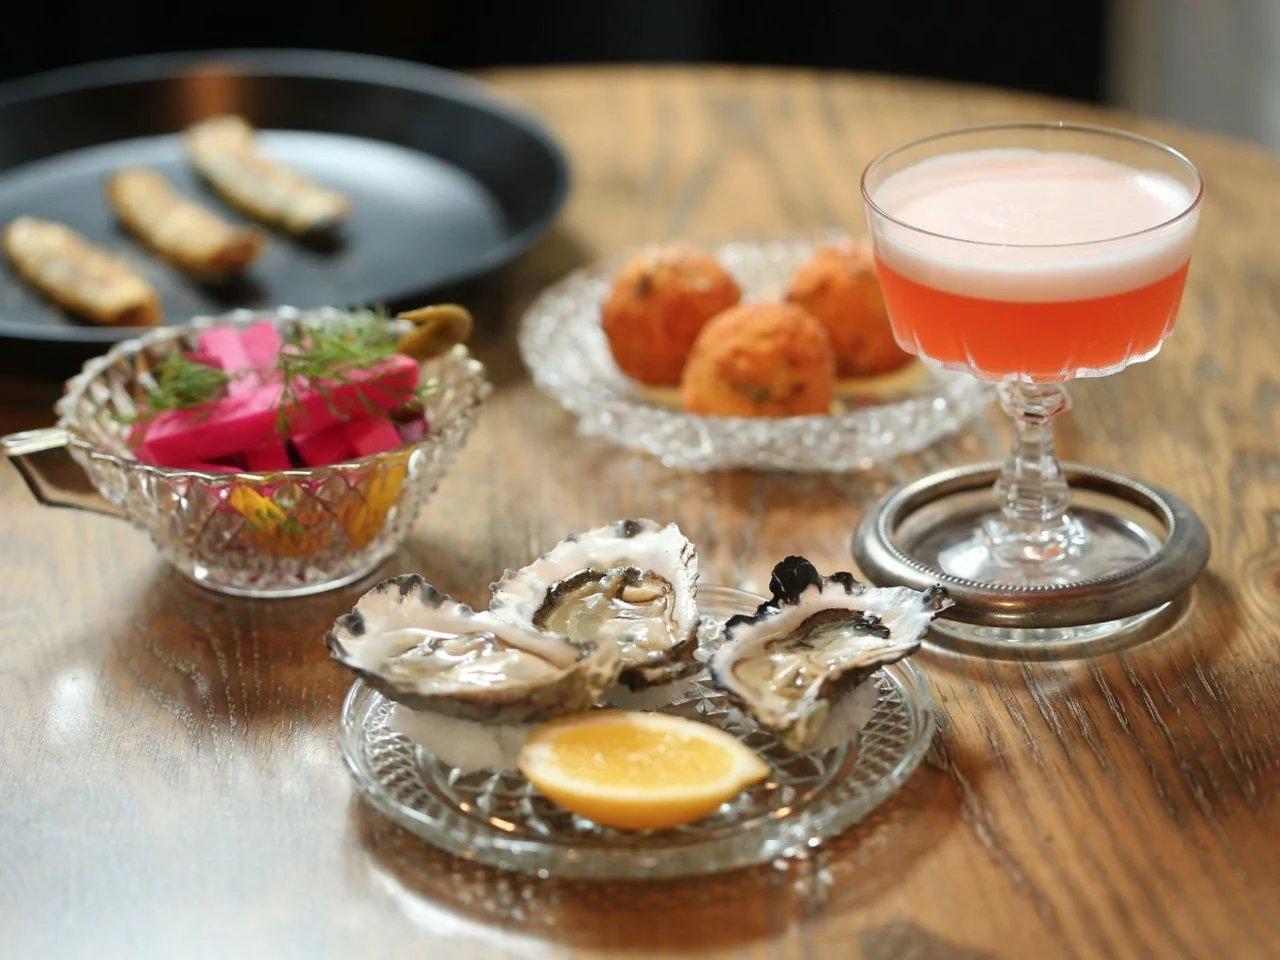 Seven Greek-Owned Restaurants Make The Cut Among Australia's Top 100